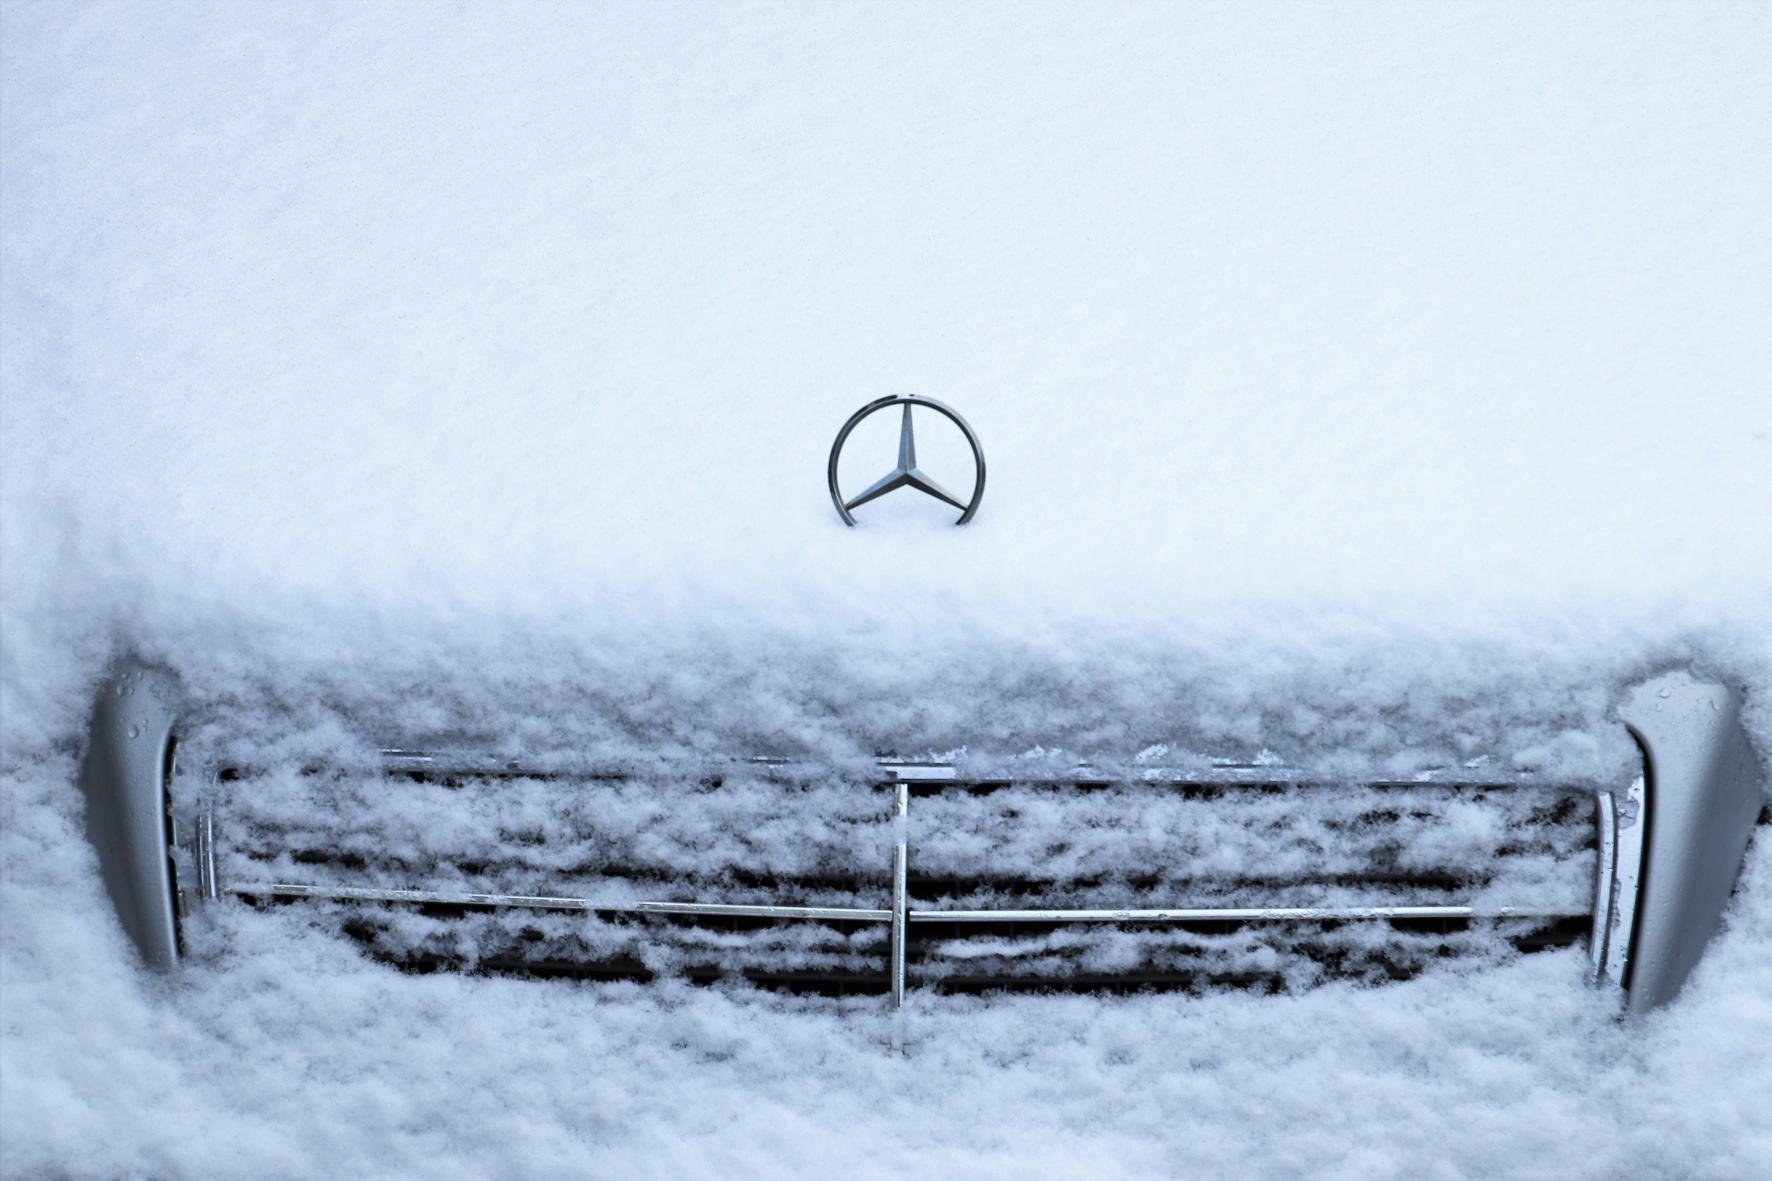 mid Groß-Gerau - Bei guter Vorbereitung trotzen Autos auch harten Wintereinbrüchen. pasja1000 / pixabay.com